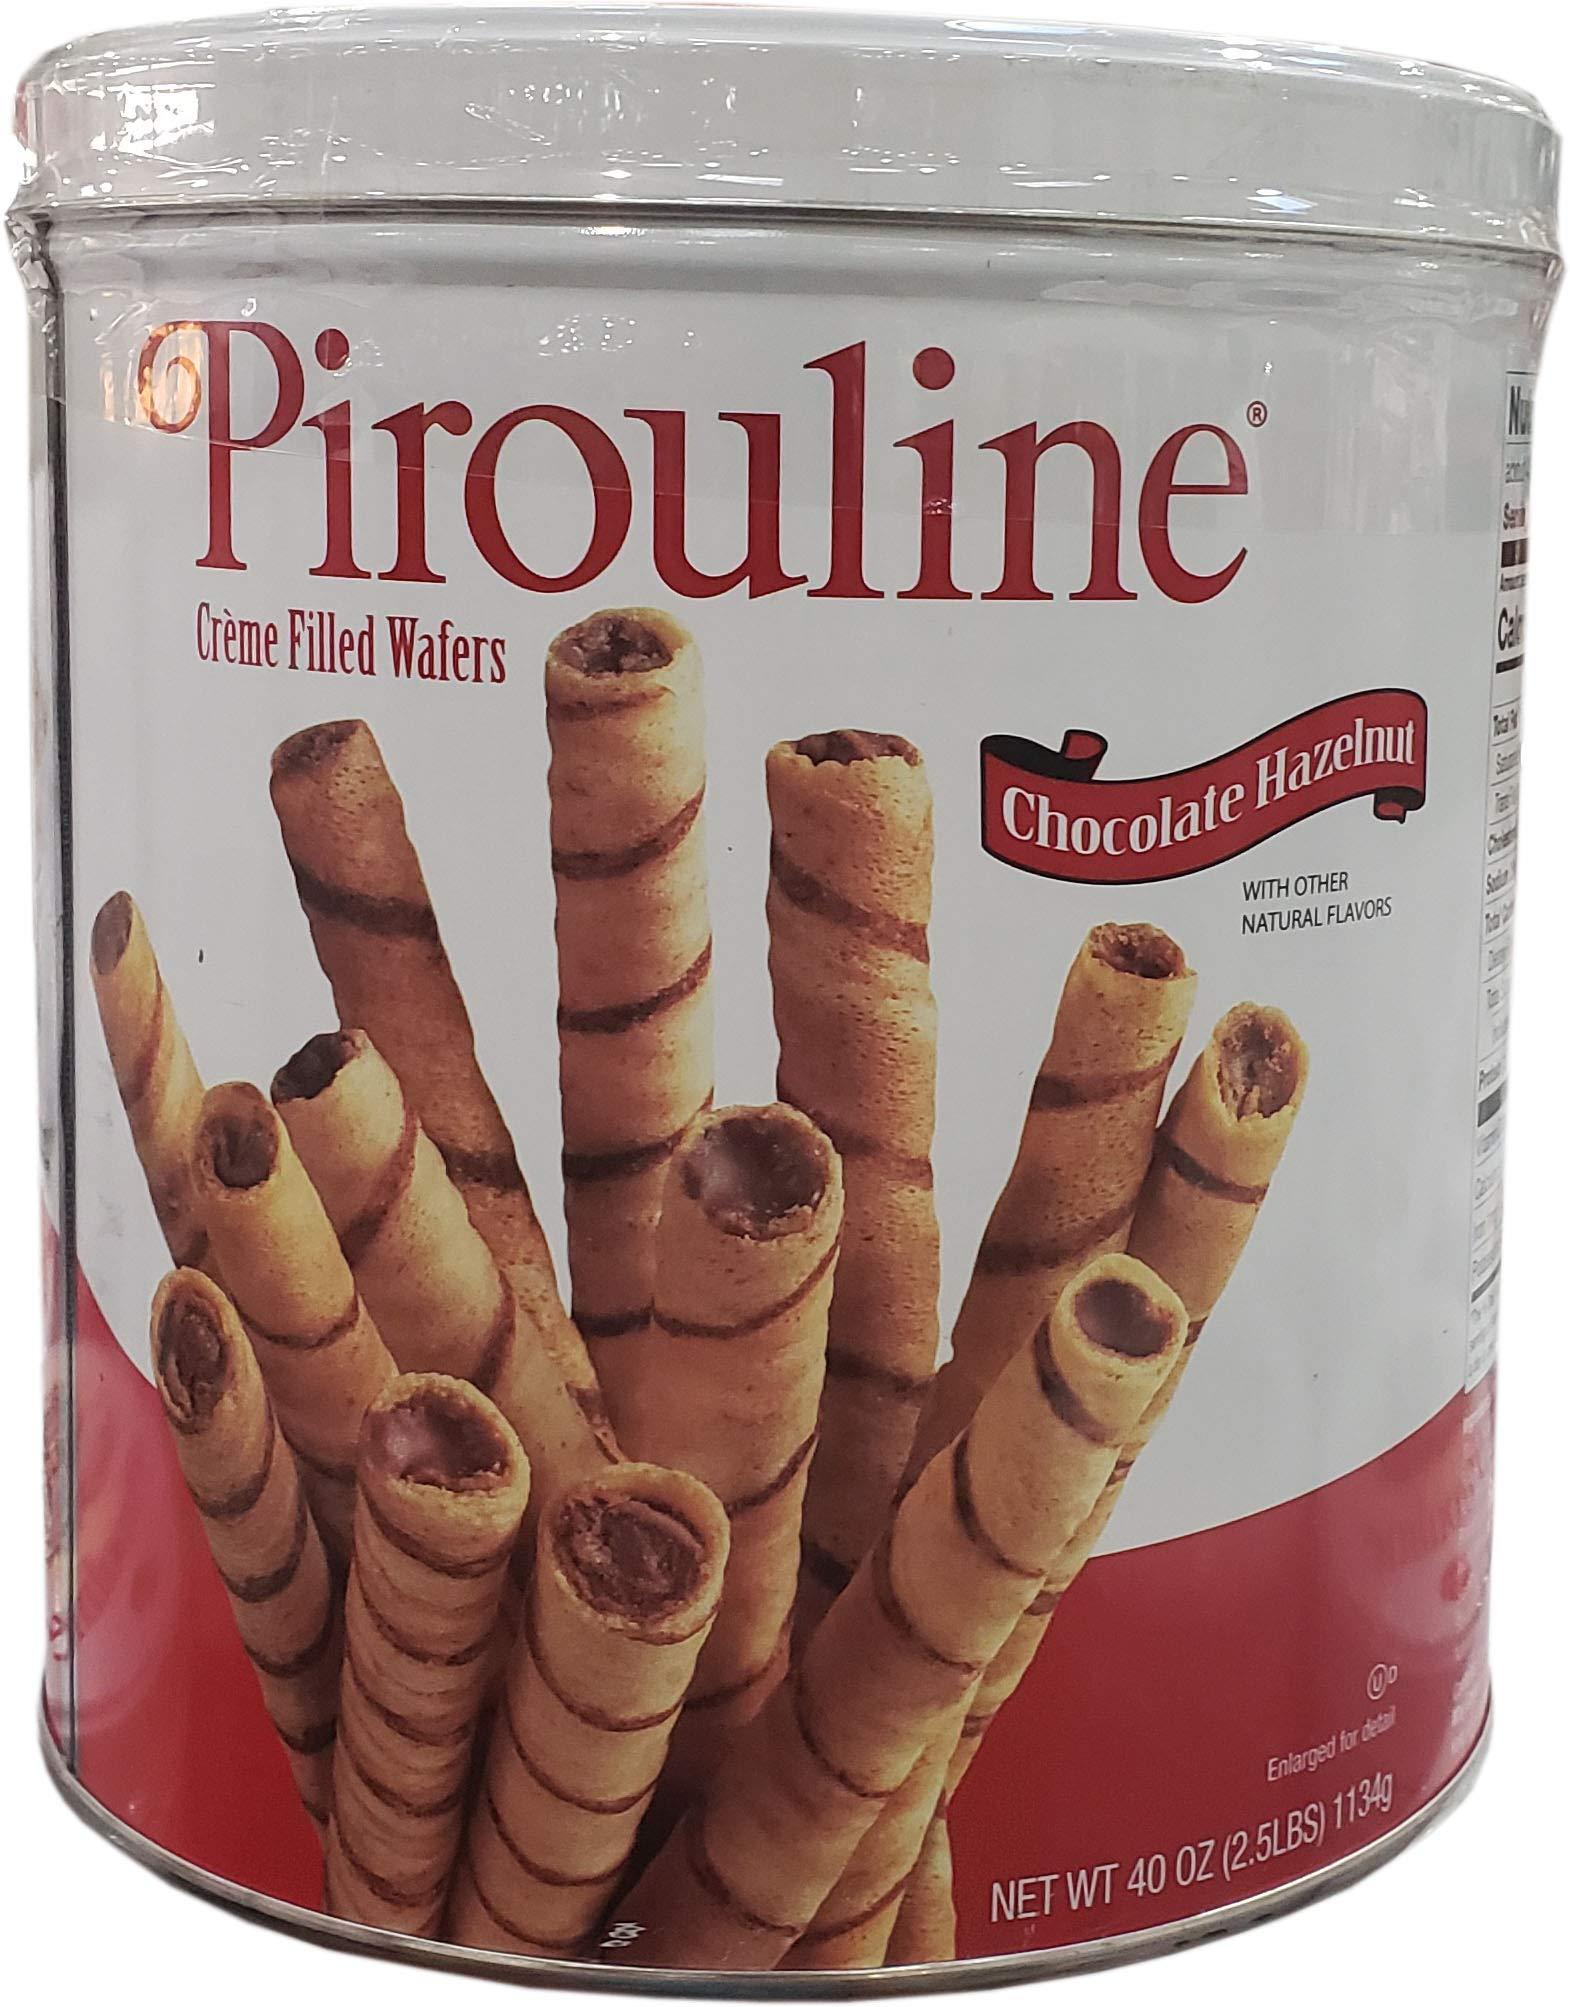 Pirouline Crème Filled Wafers Chocolate Hazelnut, 40 Ounce